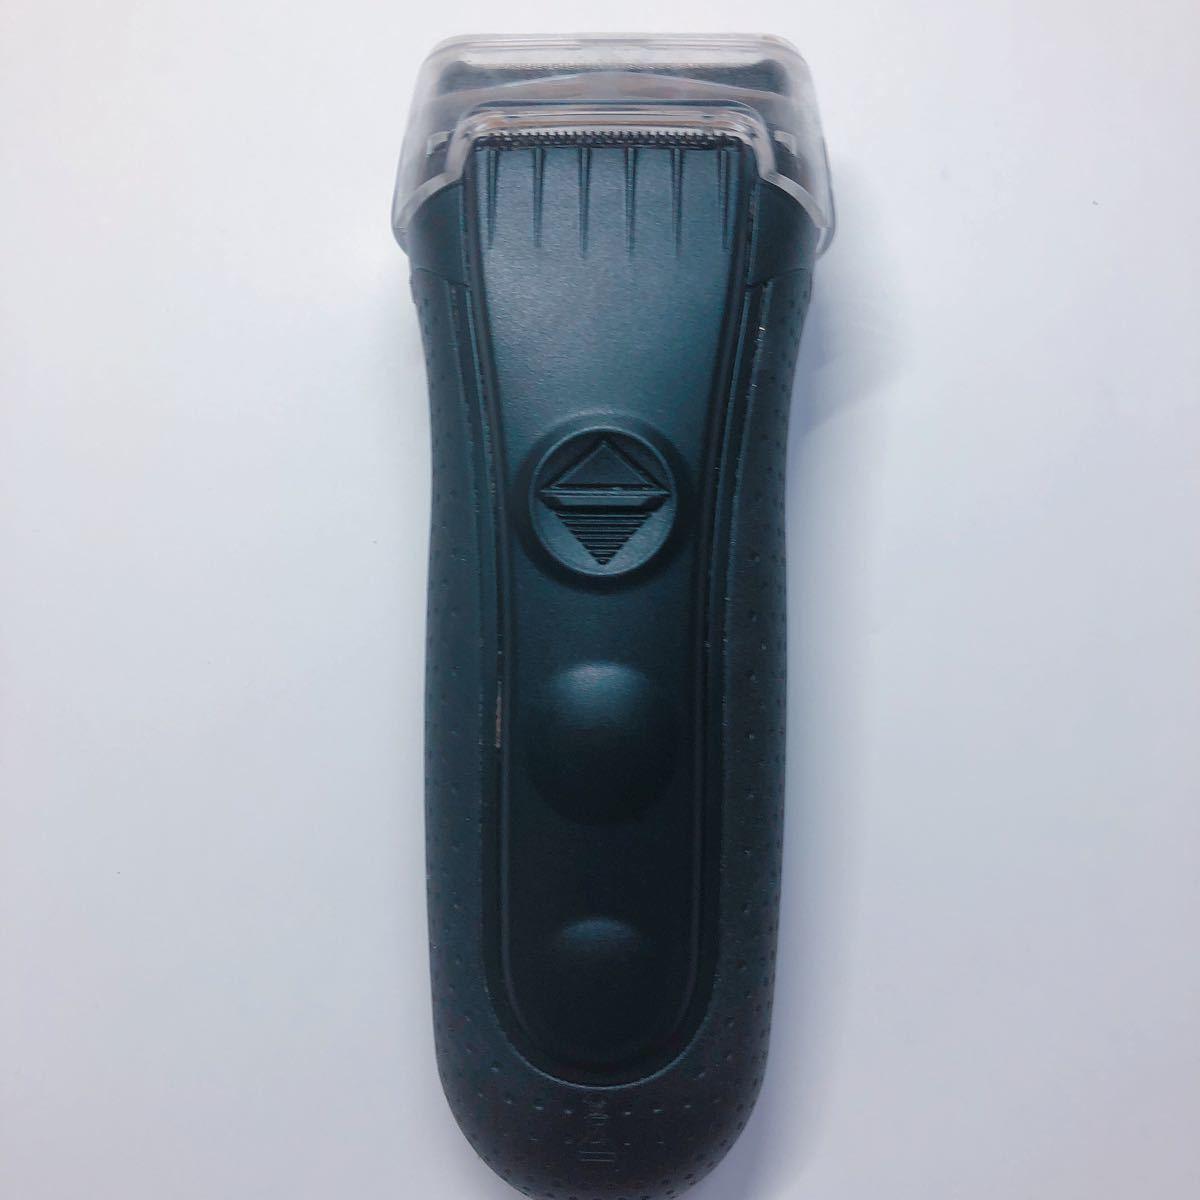 BRAUN 髭剃り 電気シェーバー メンズ 3020S-B-P1 3枚刄 メンズシェーバー ブラウン